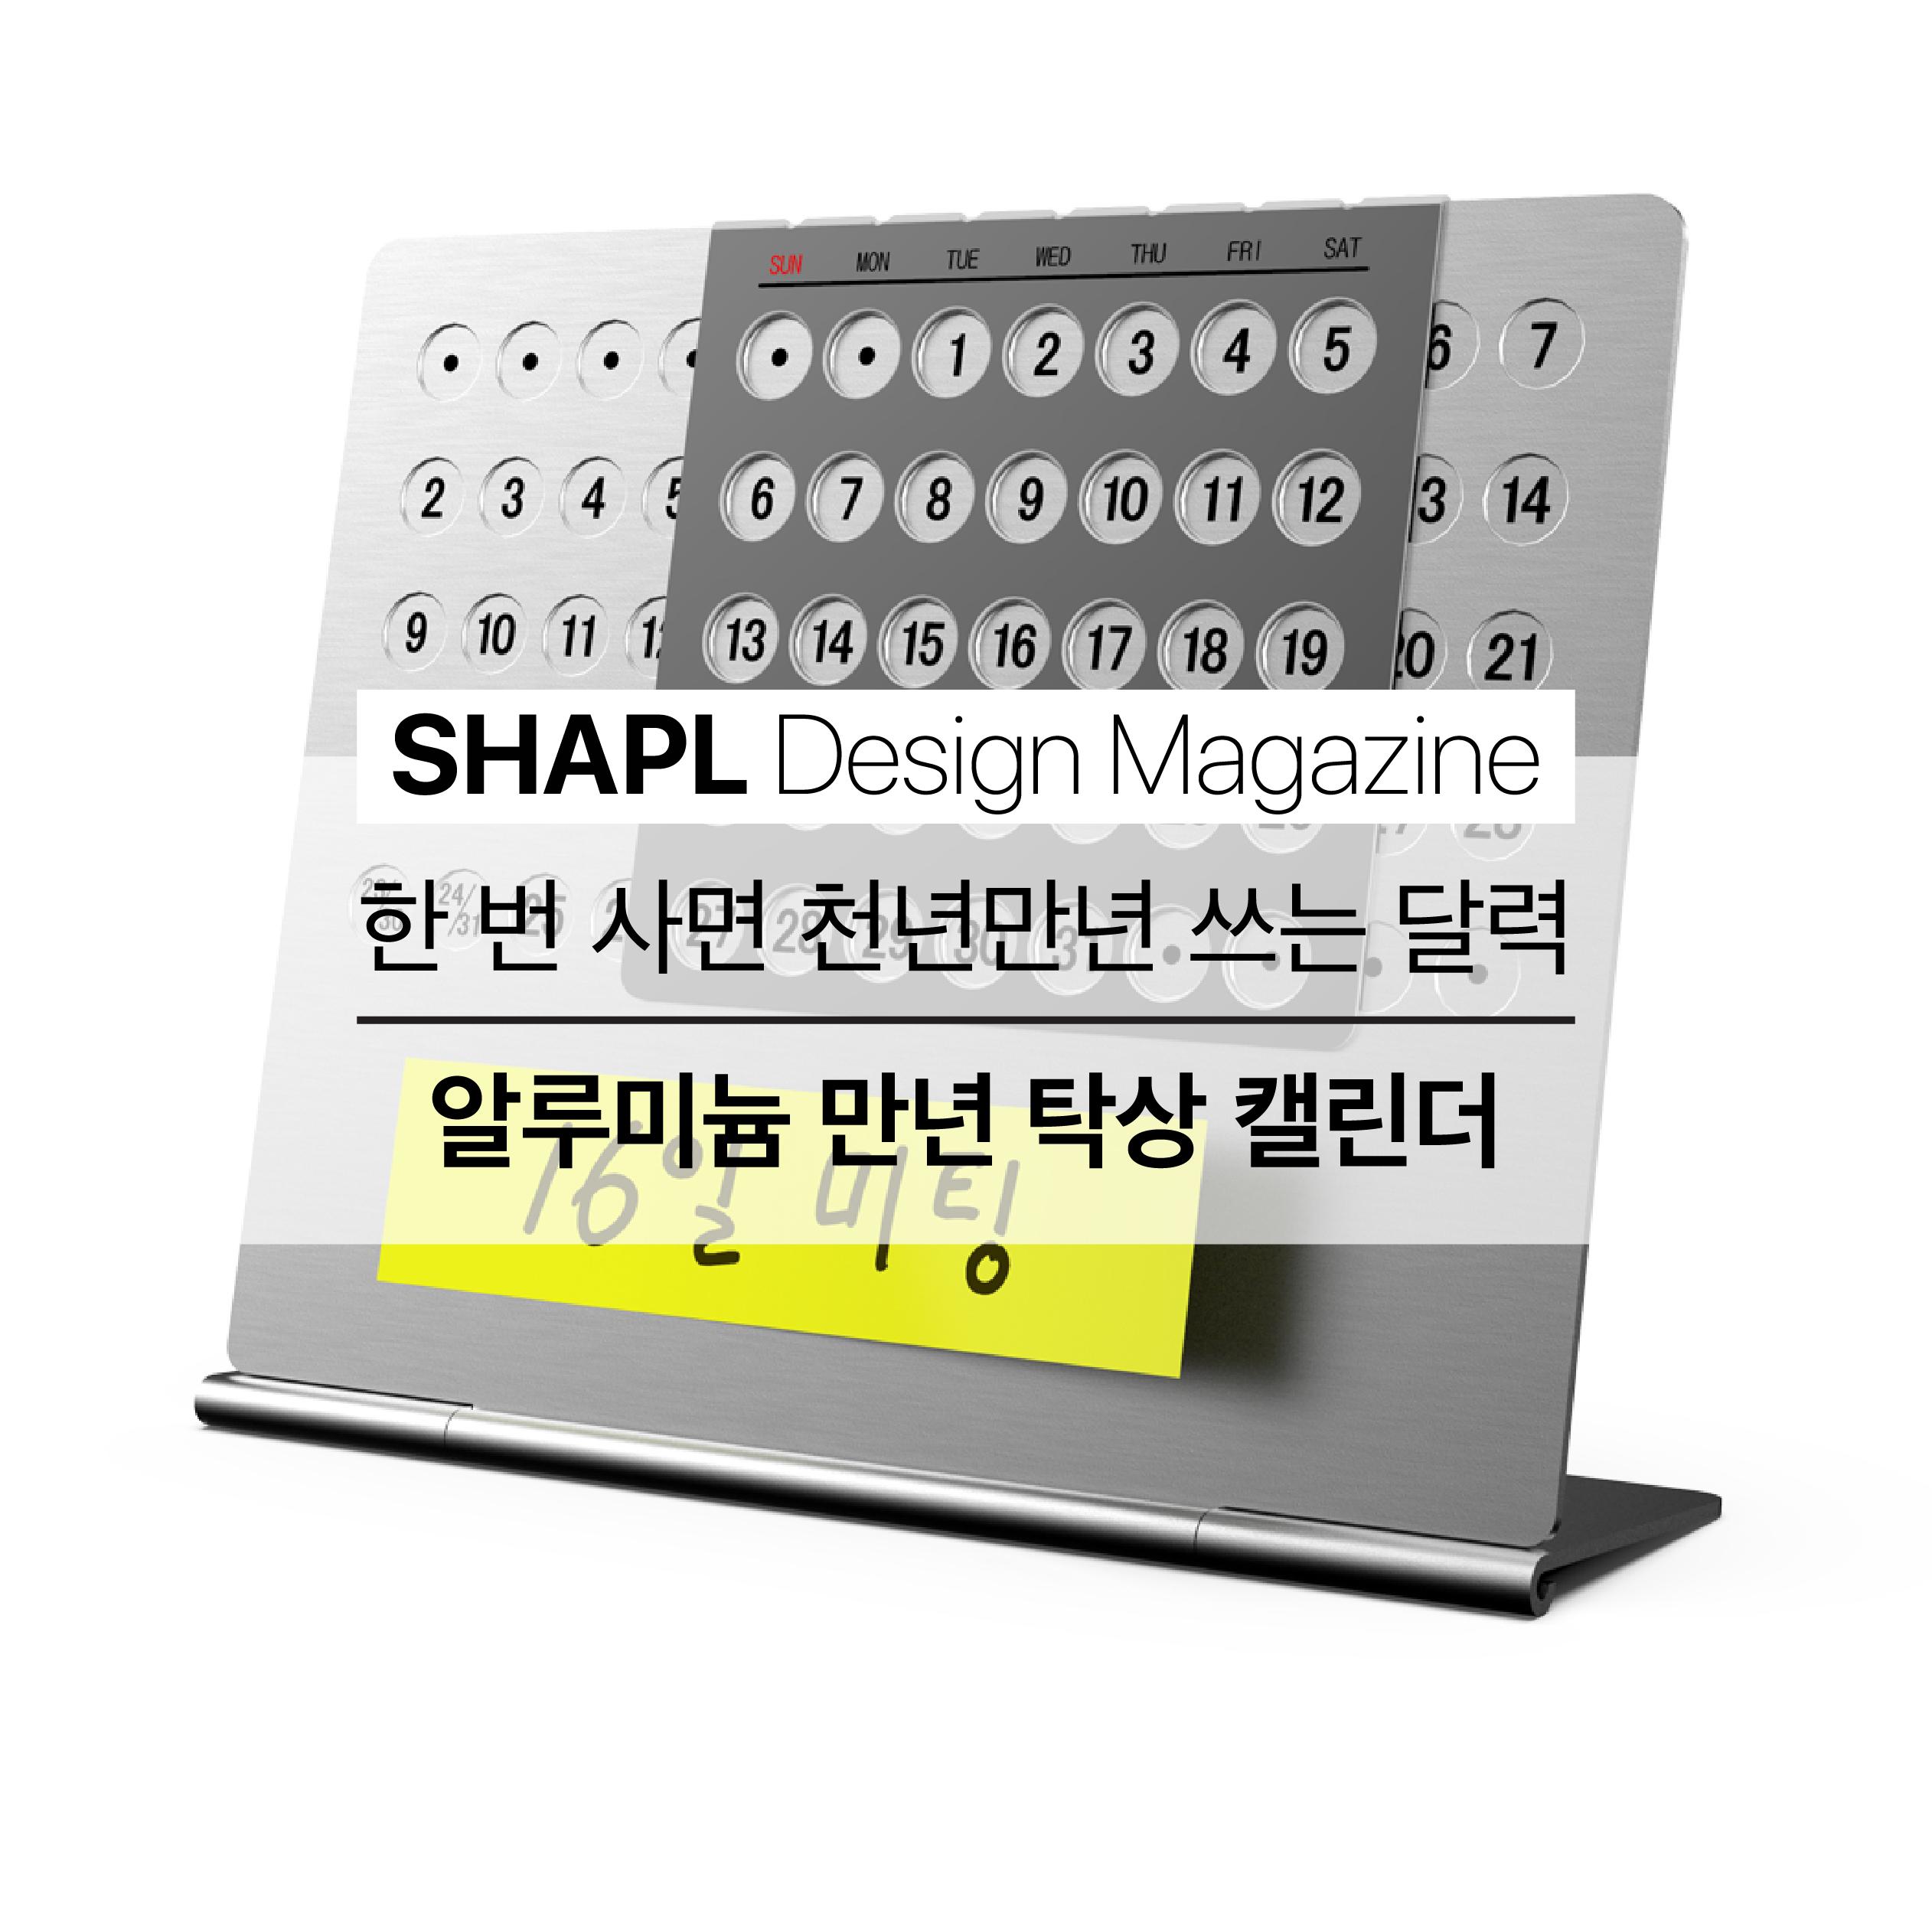 [SHAPL Design Magazine] 알루미늄 만년 탁상 캘린더